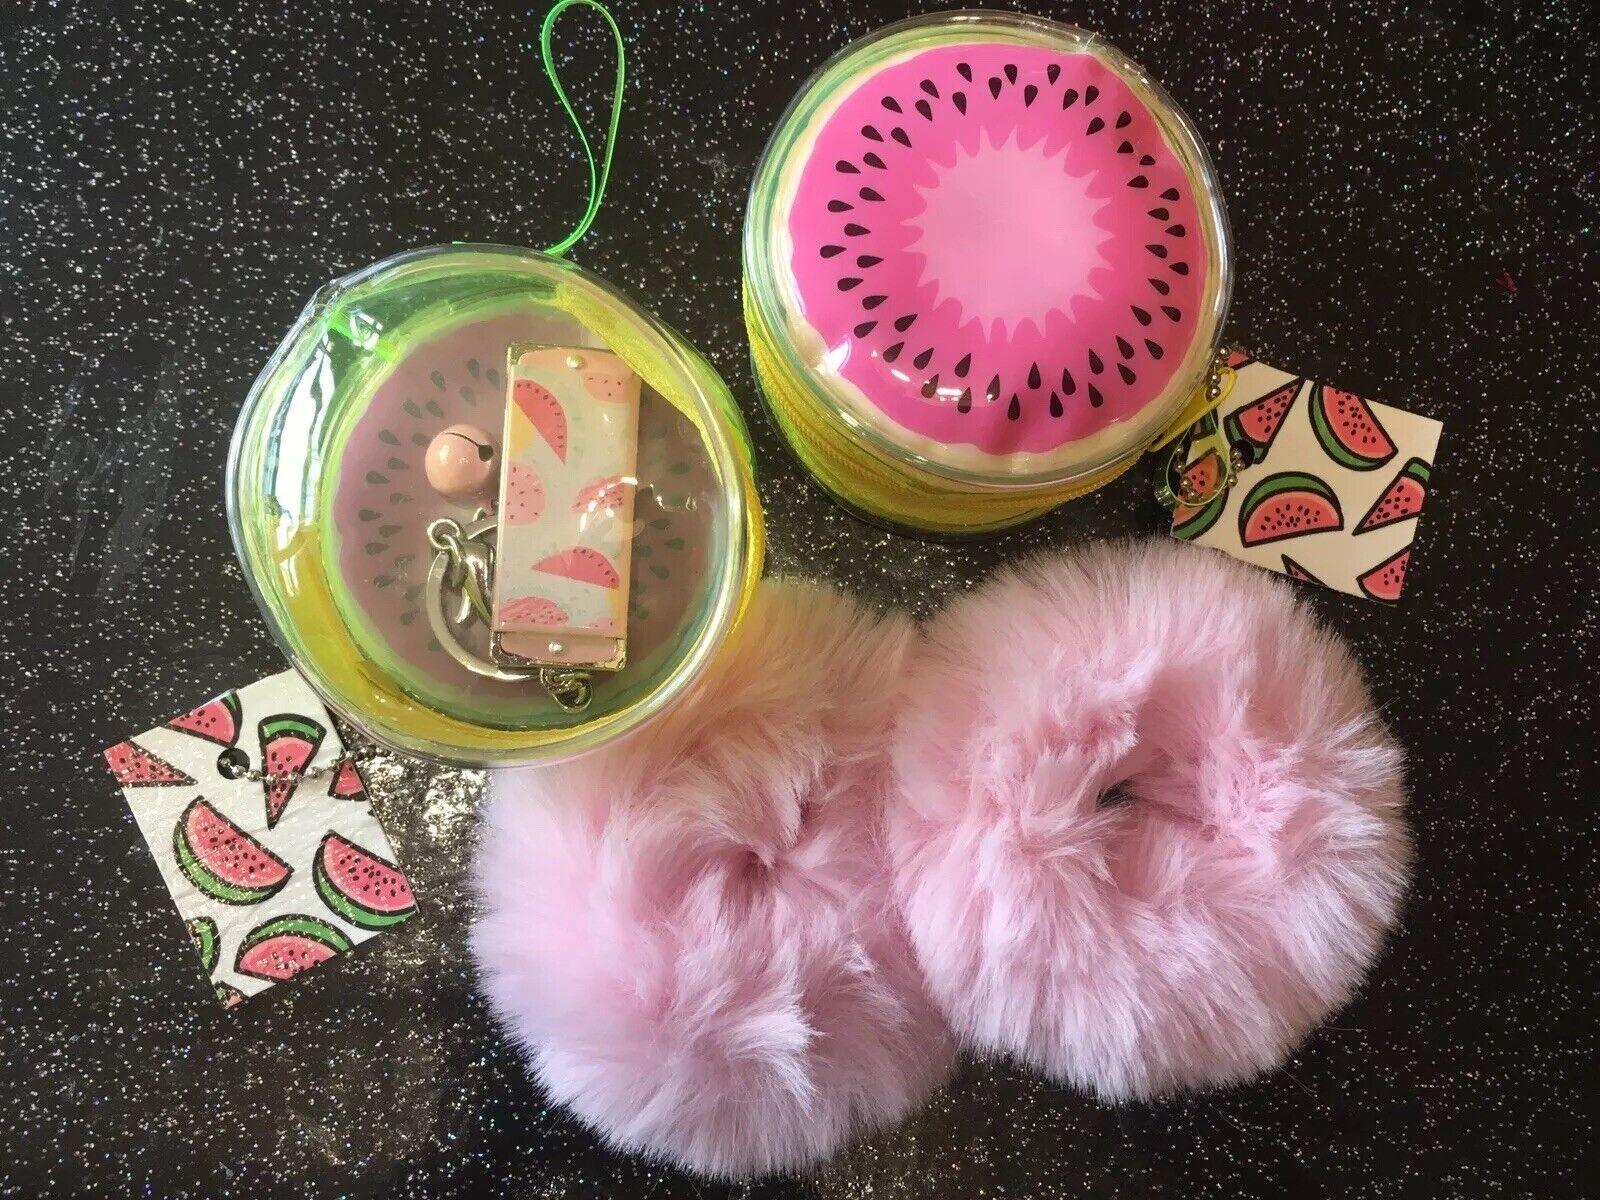 Round Pink 🍉Watermelon Purse +Harmonica Keyring +2 Fur Hair Bands 4pc Gift Set